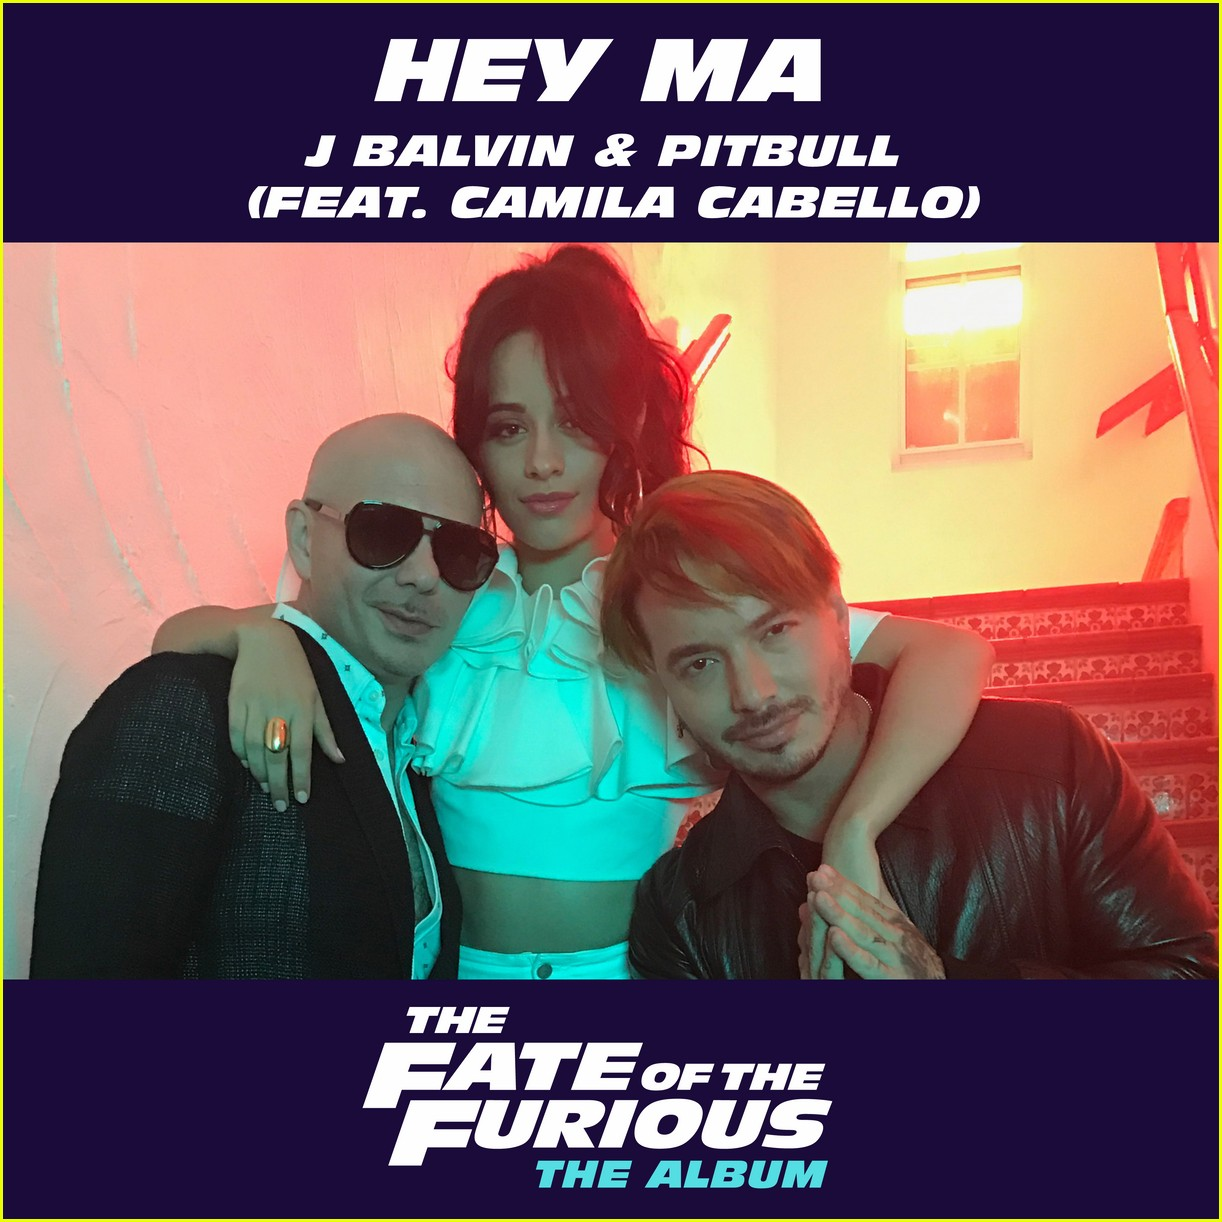 watch pitbull camila cabello and j balvin in hey ma english vesion music video 02